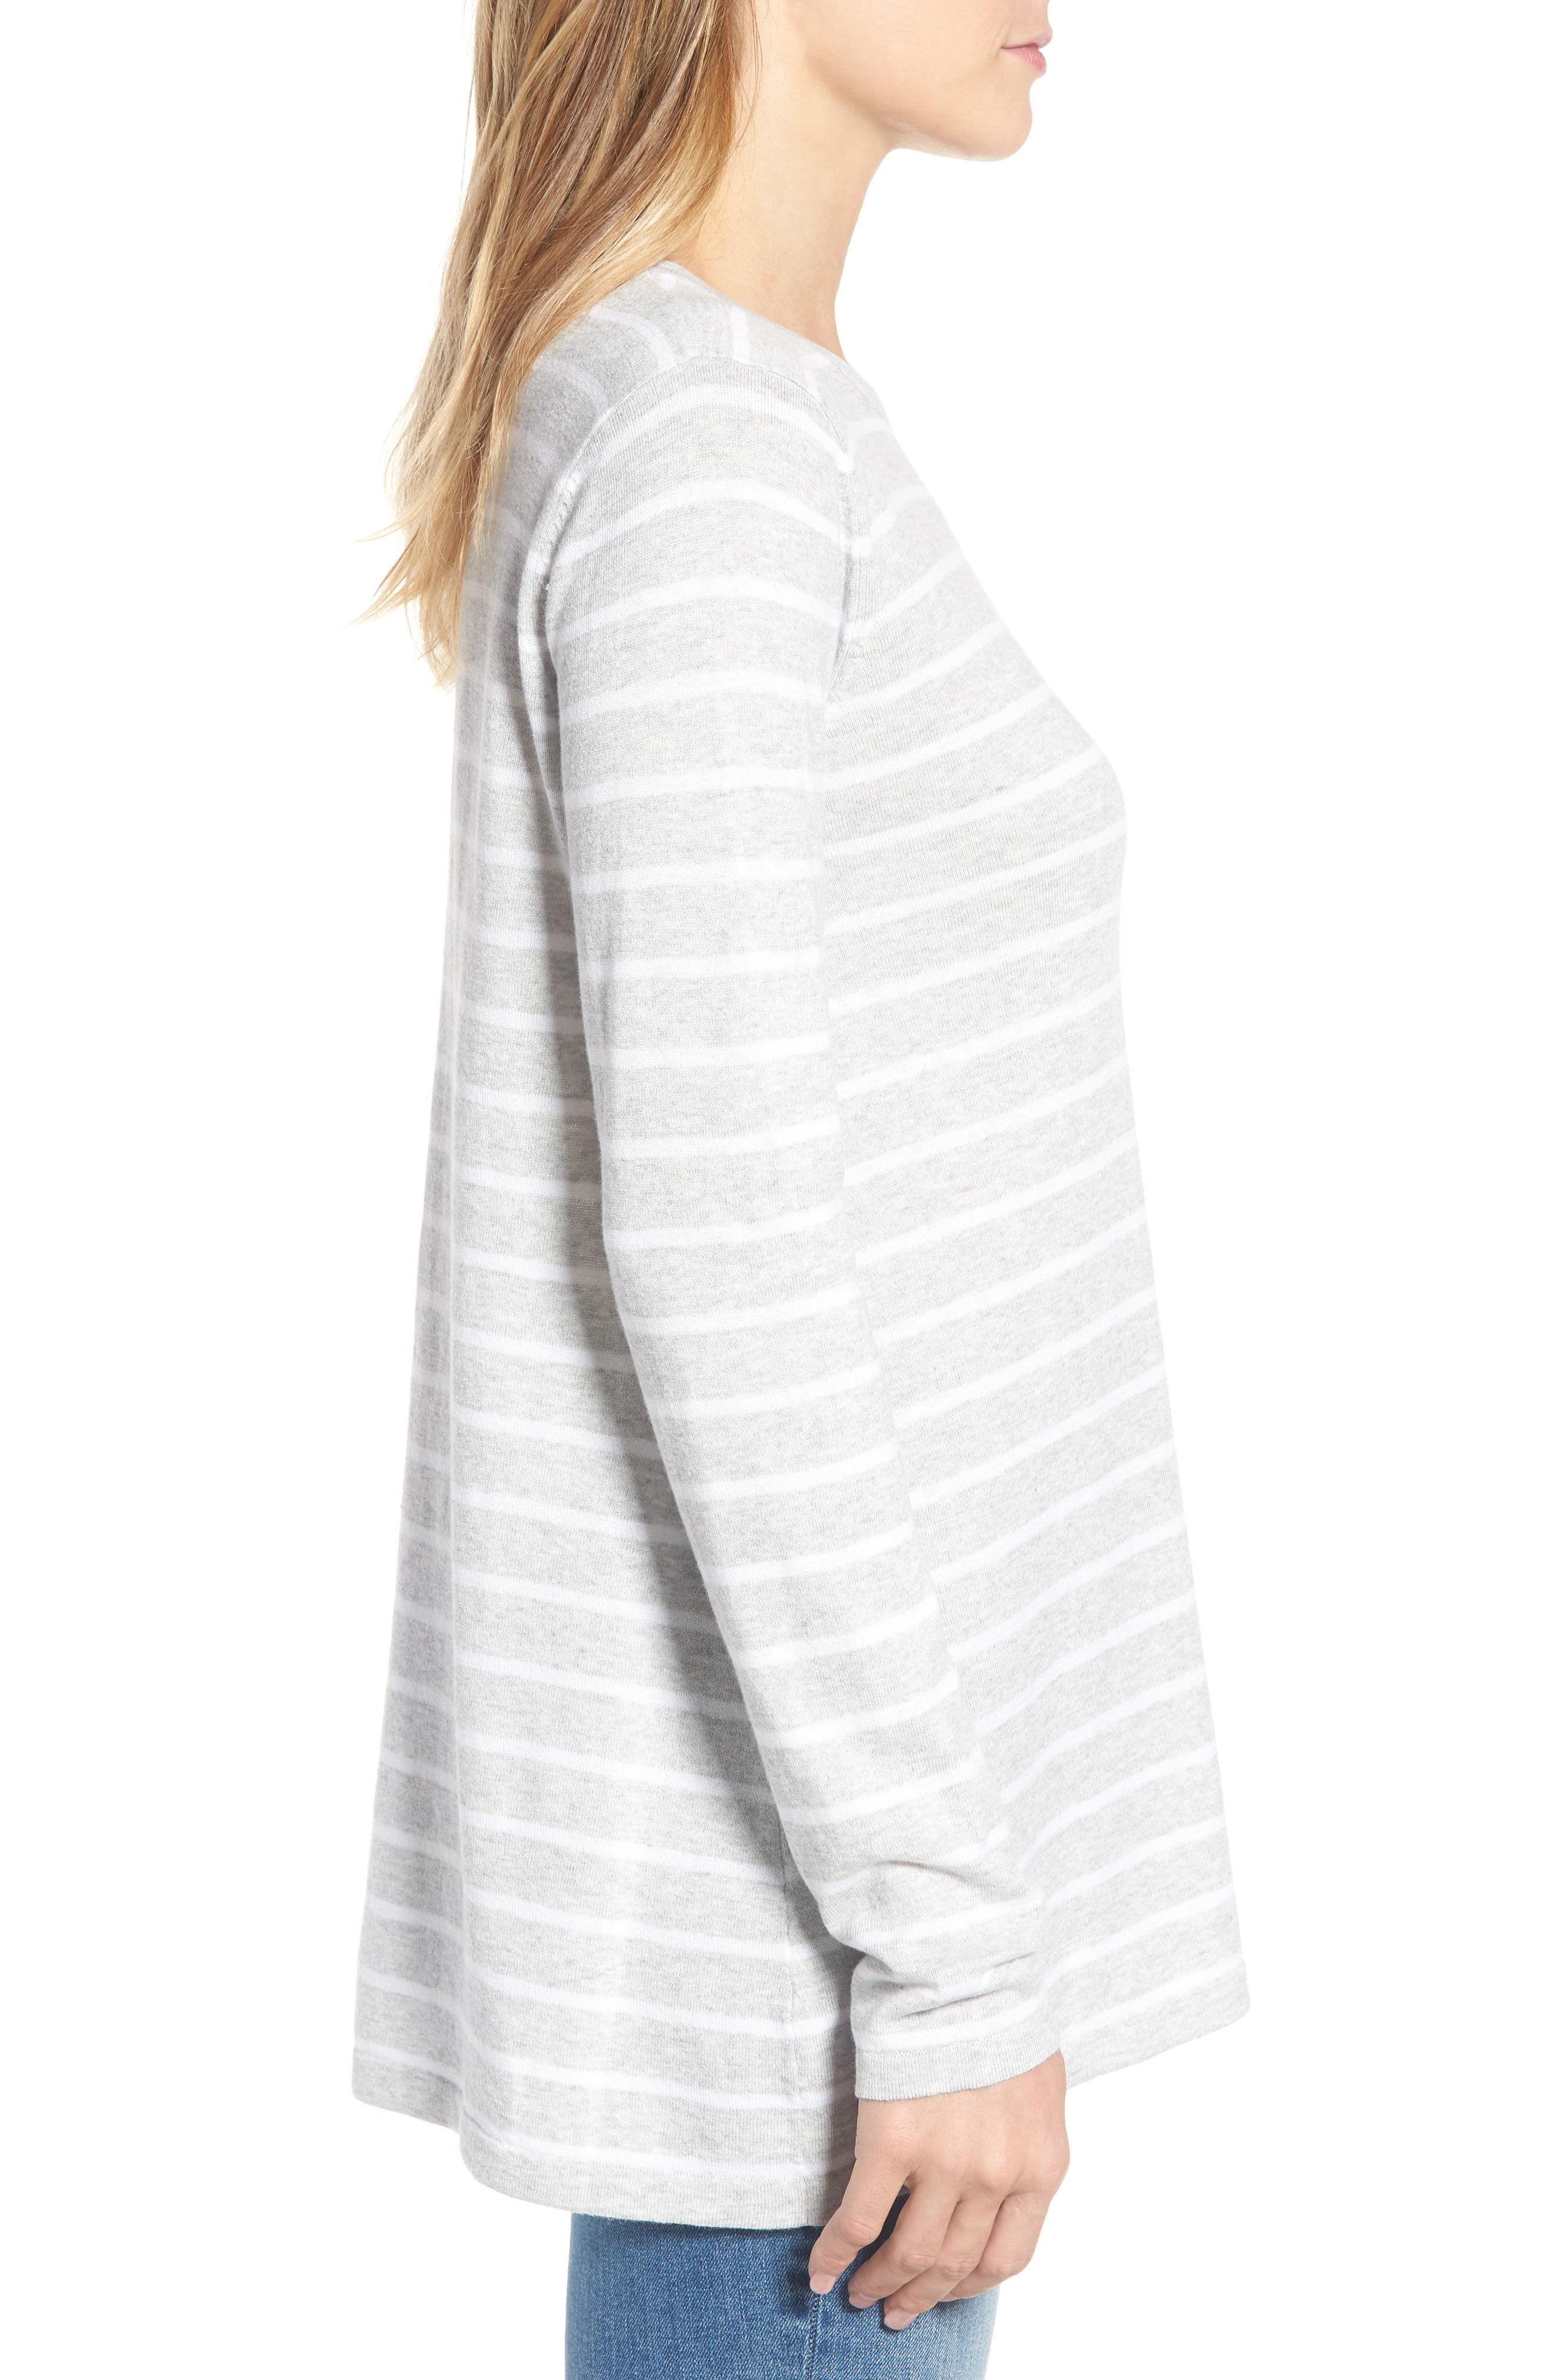 Cotton Blend Stripe Trapeze Cotton Blend Sweater,                             Alternate thumbnail 3, color,                             Pebble Grey Mix Warm White